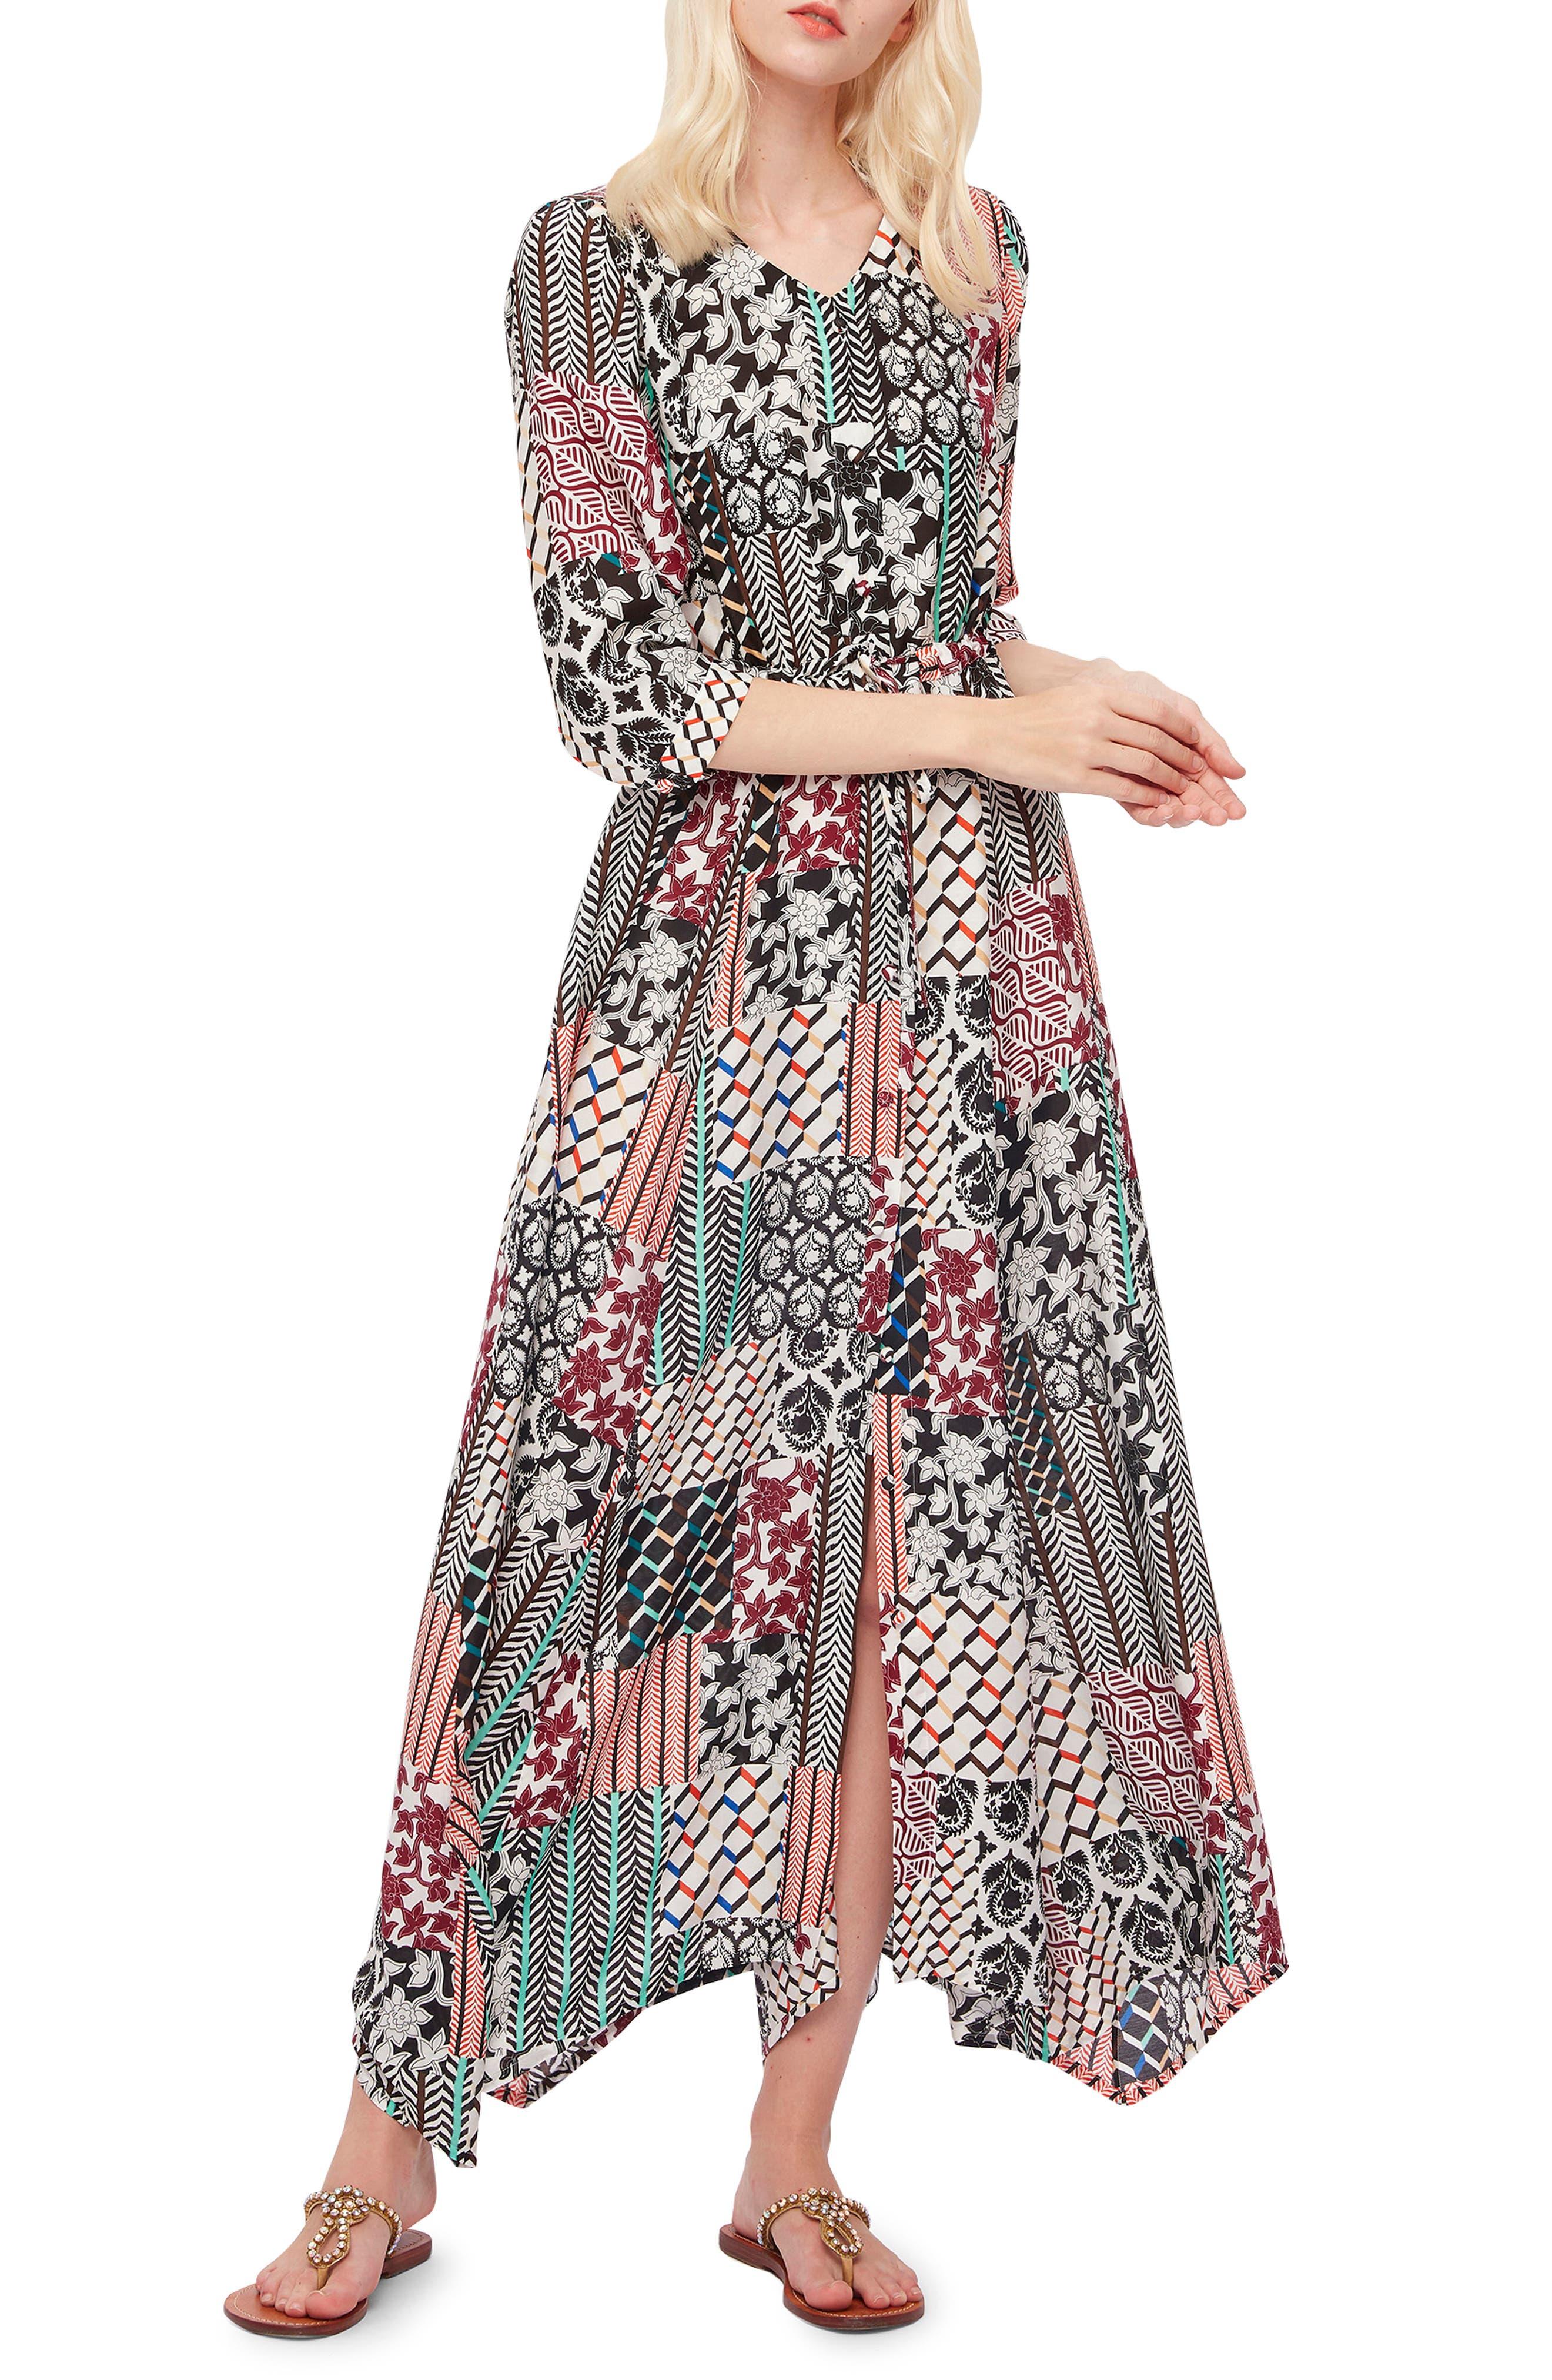 Lily Woven Maxi Dress